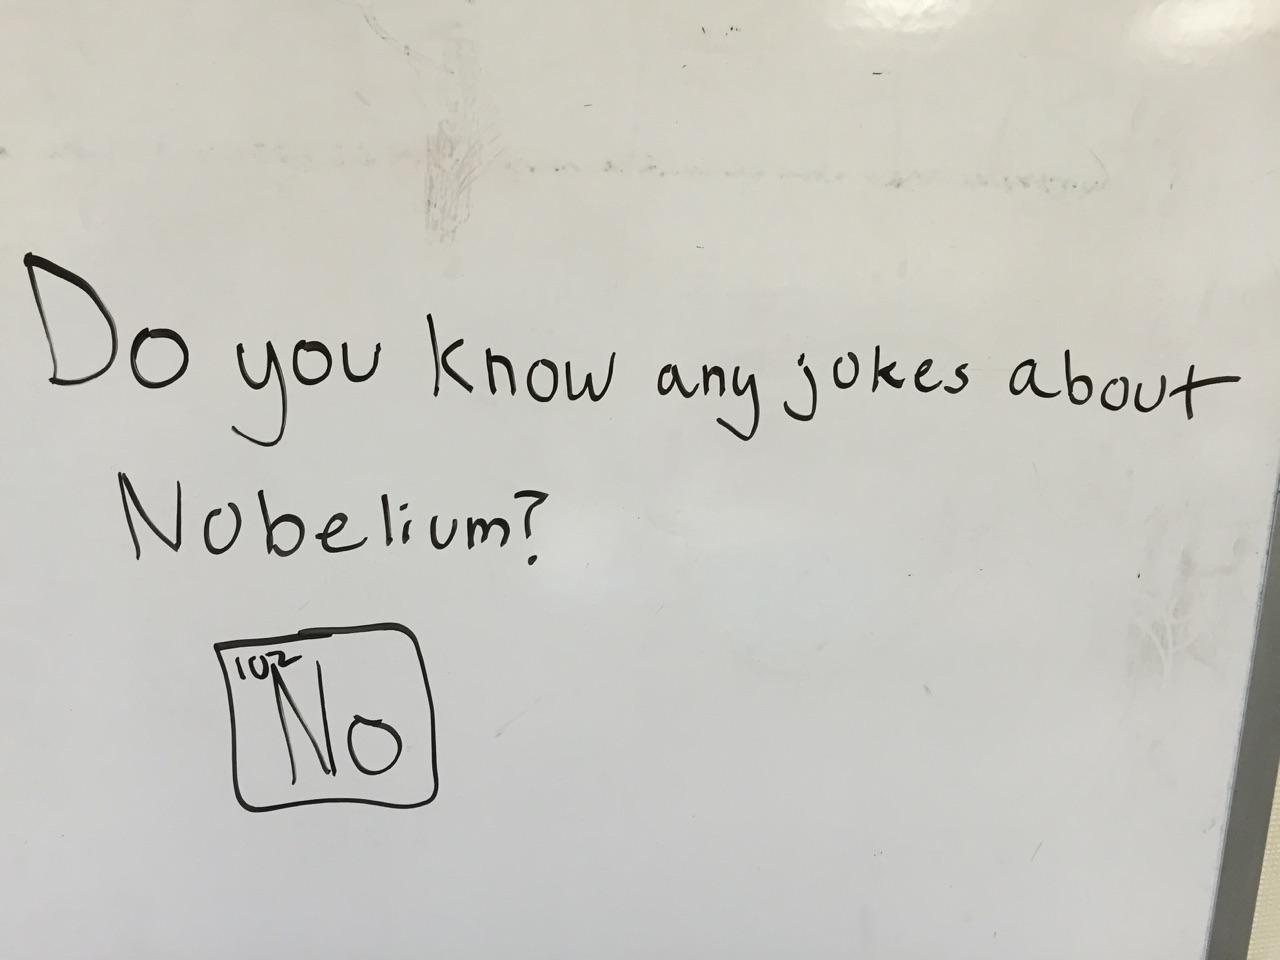 Chemistry jokes